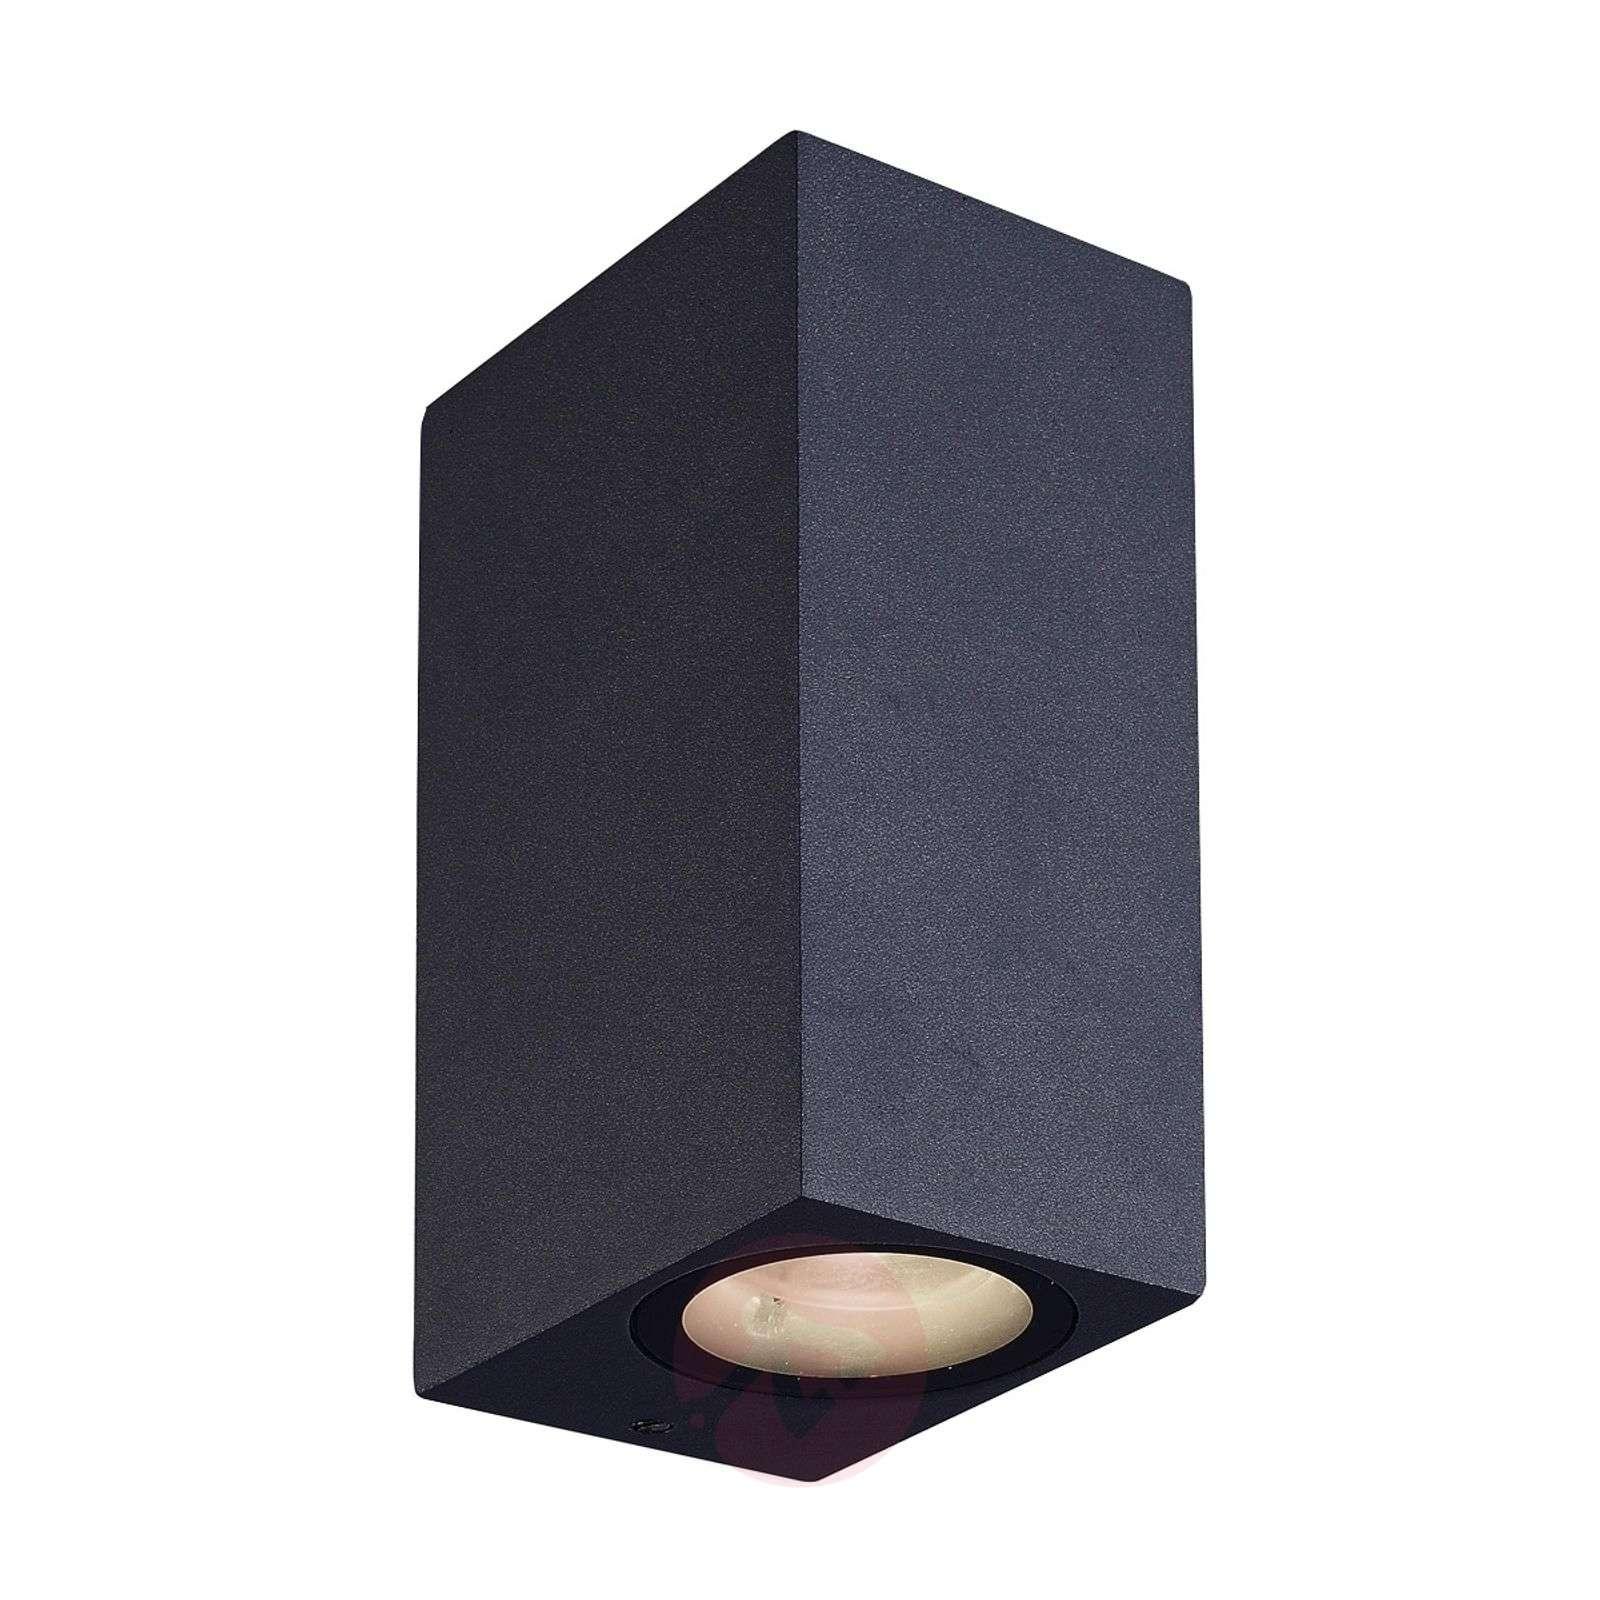 Tavi outdoor wall light with 2 Bridgelux LEDs-9616011-01